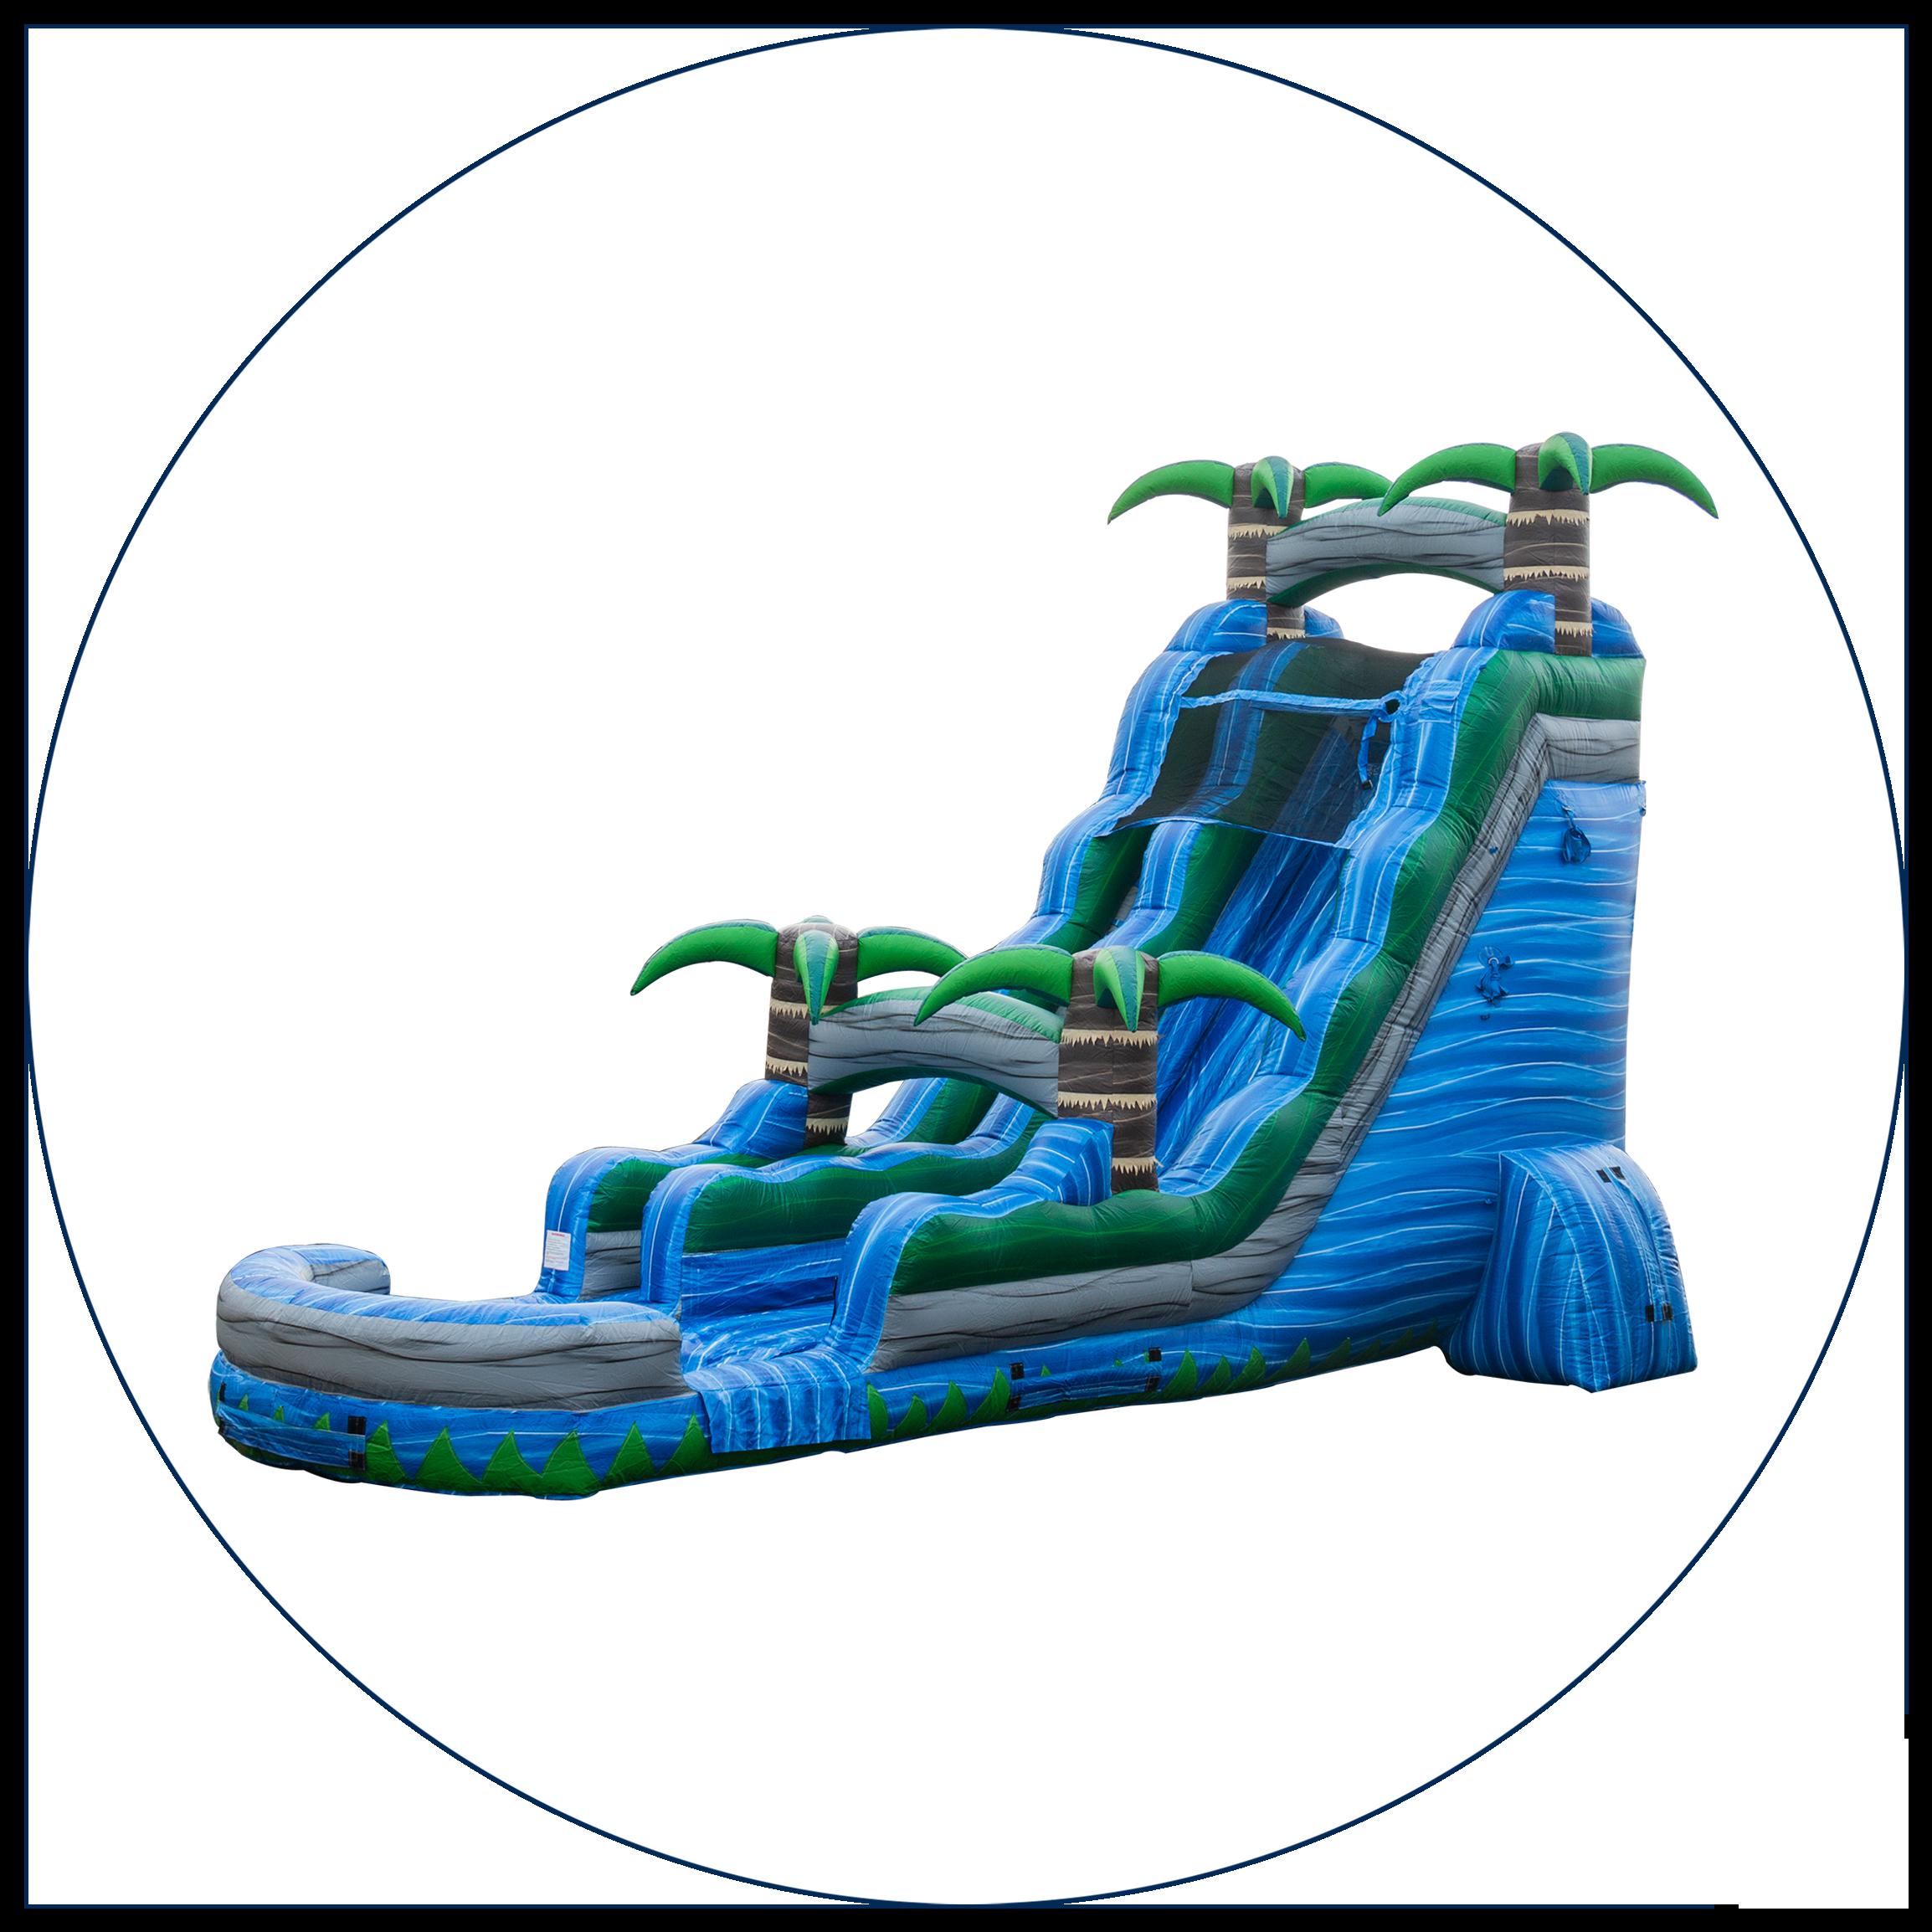 22 Ft. Water Slides